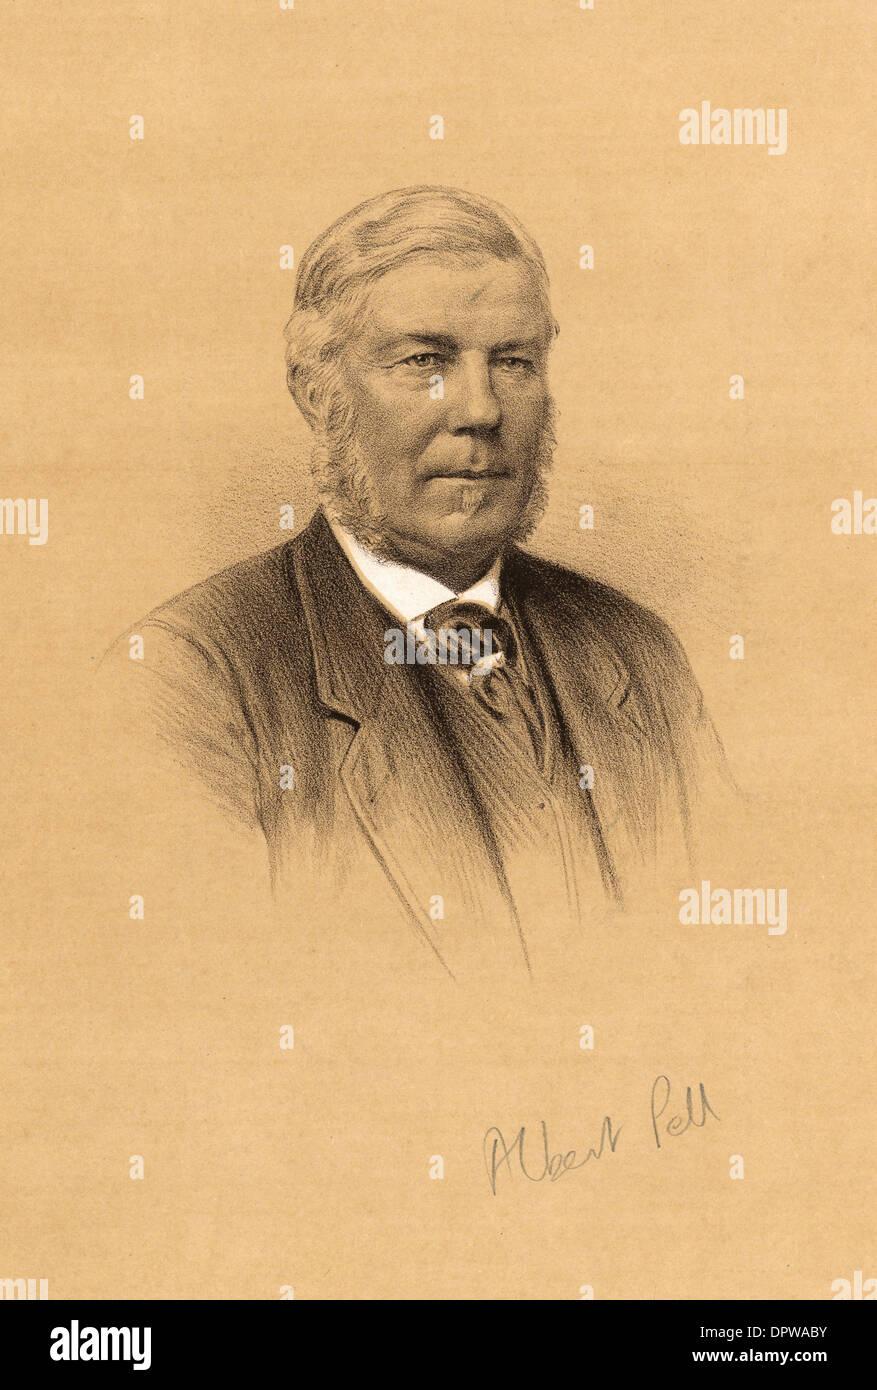 ALBERT PELL - Stock Image